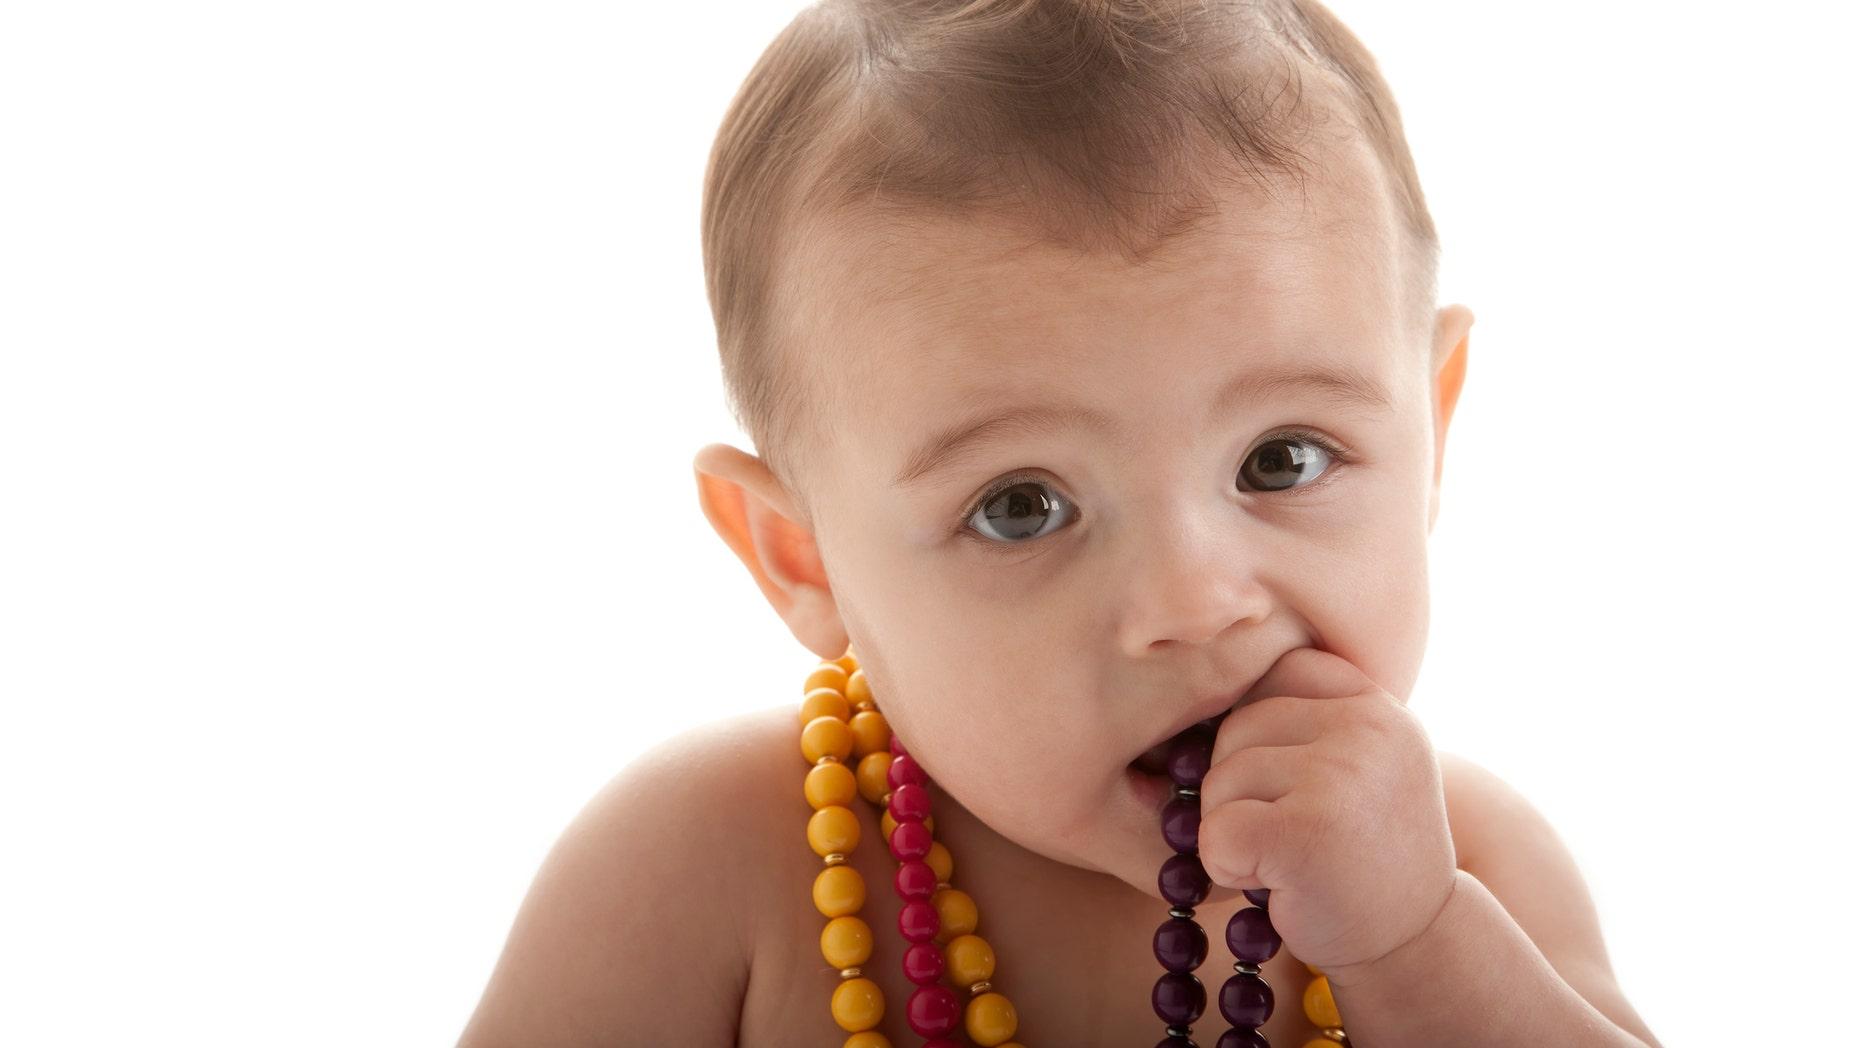 FDA warns against teething necklaces, bracelets over choking, strangulation concerns